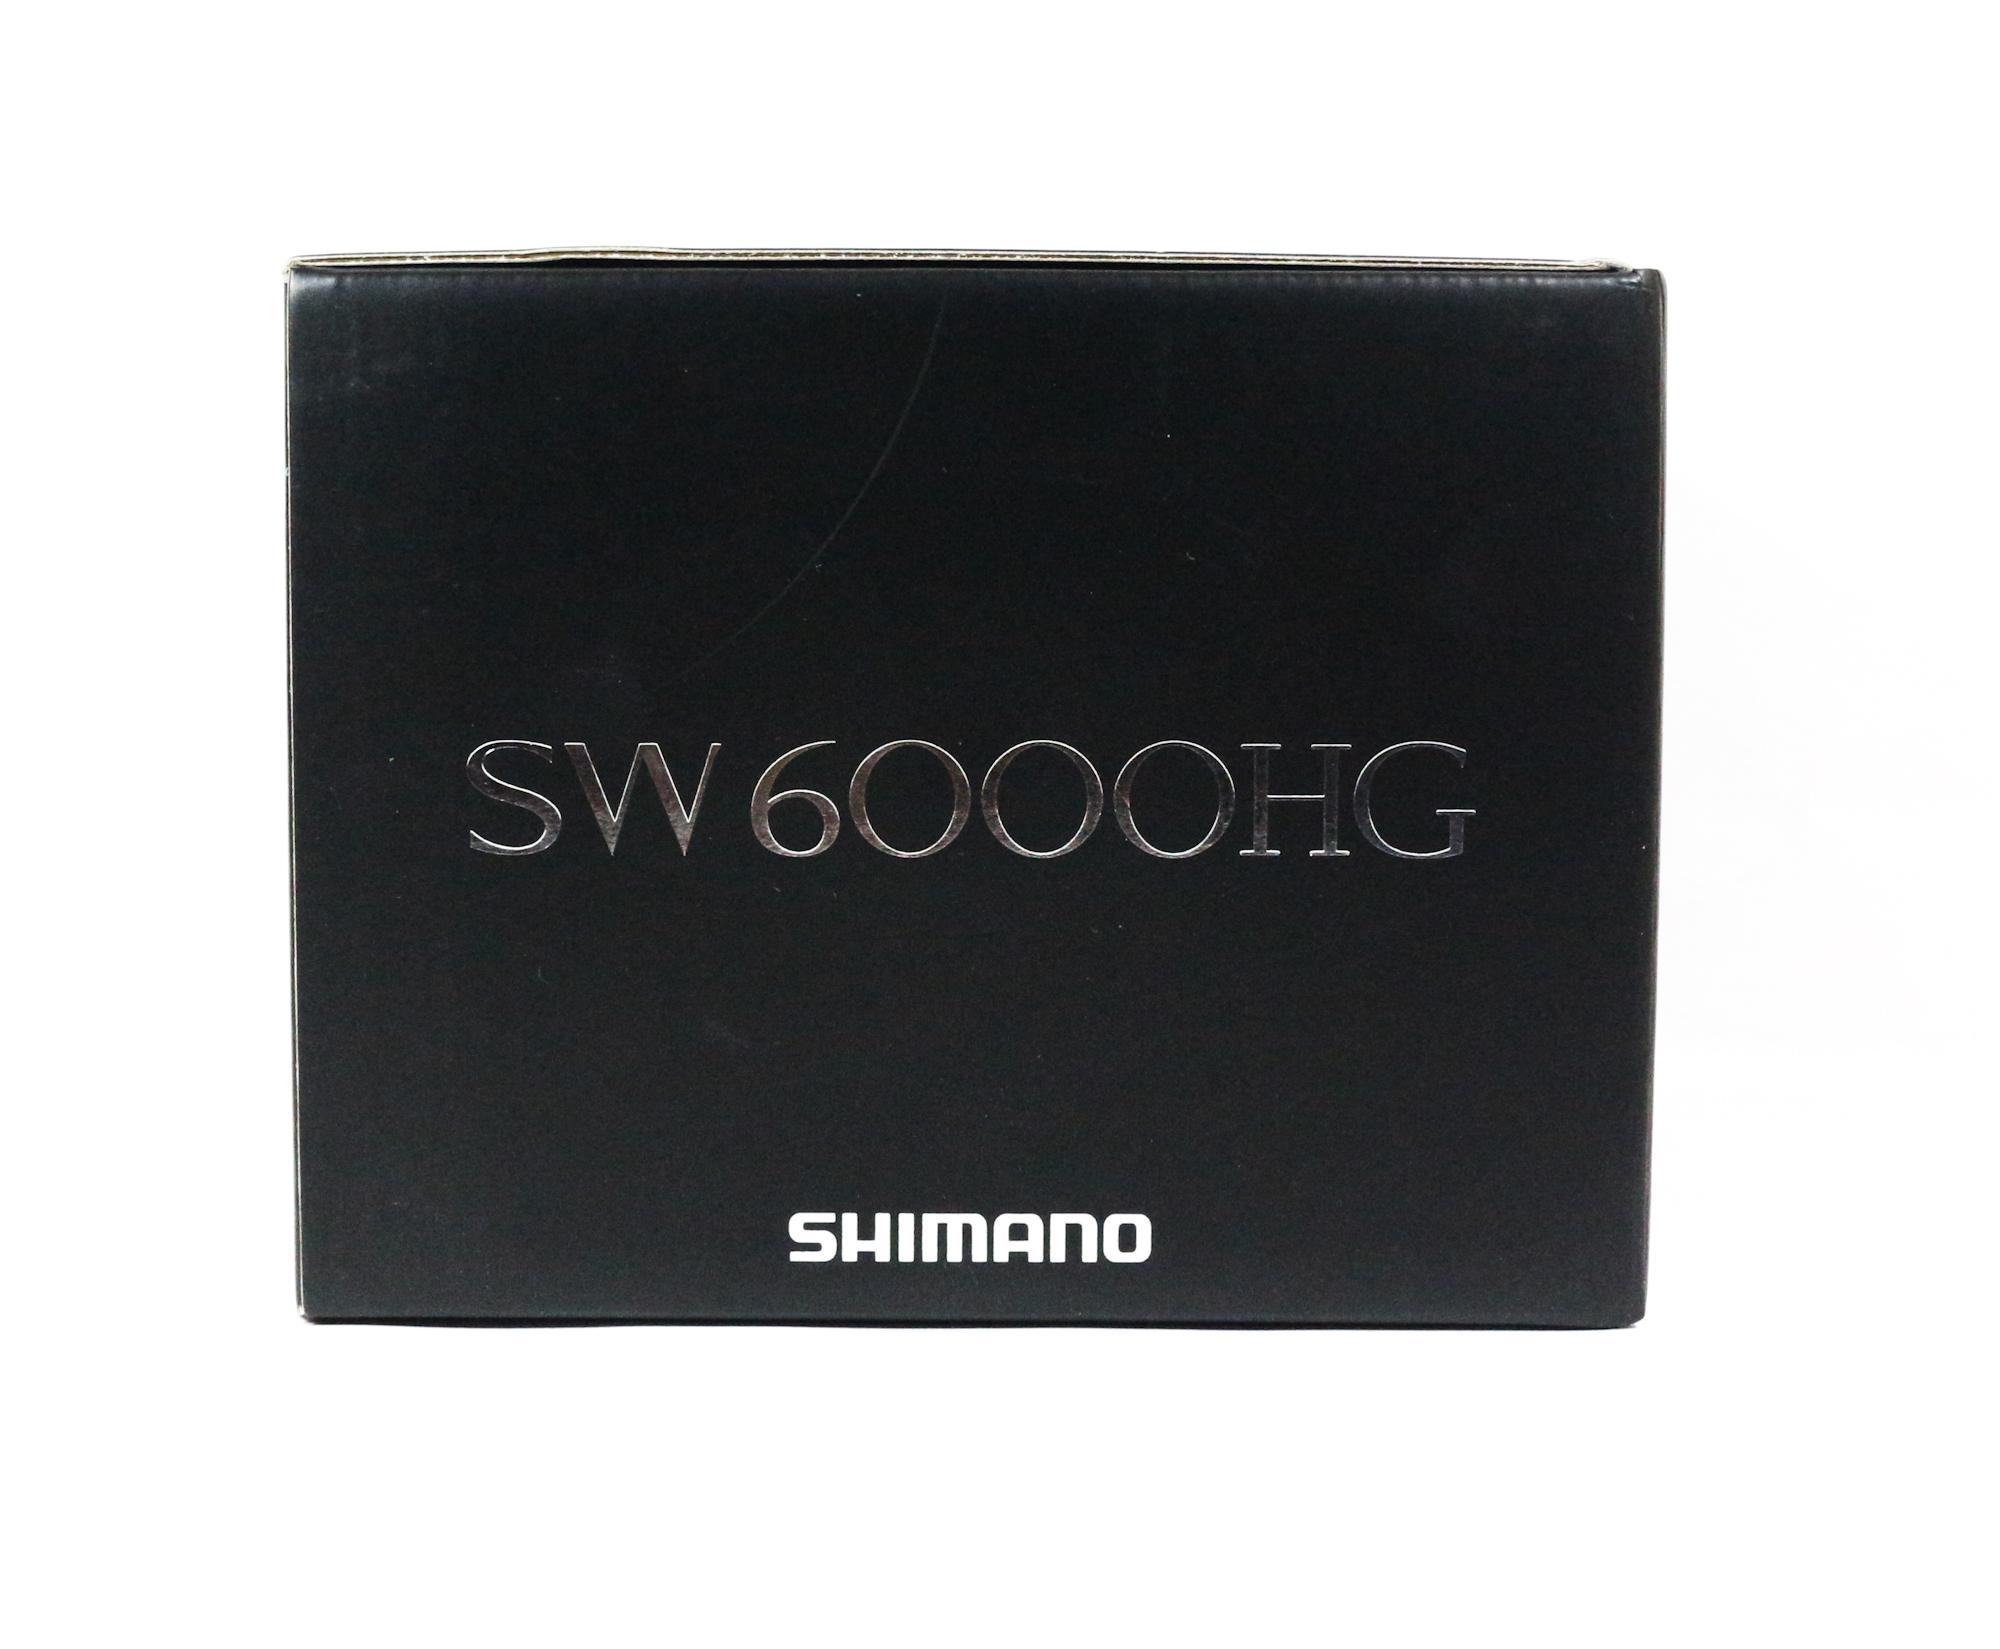 Shimano Reel Spinning Stella STLSW6000HGC SW 6000 HG 2020 (2194)